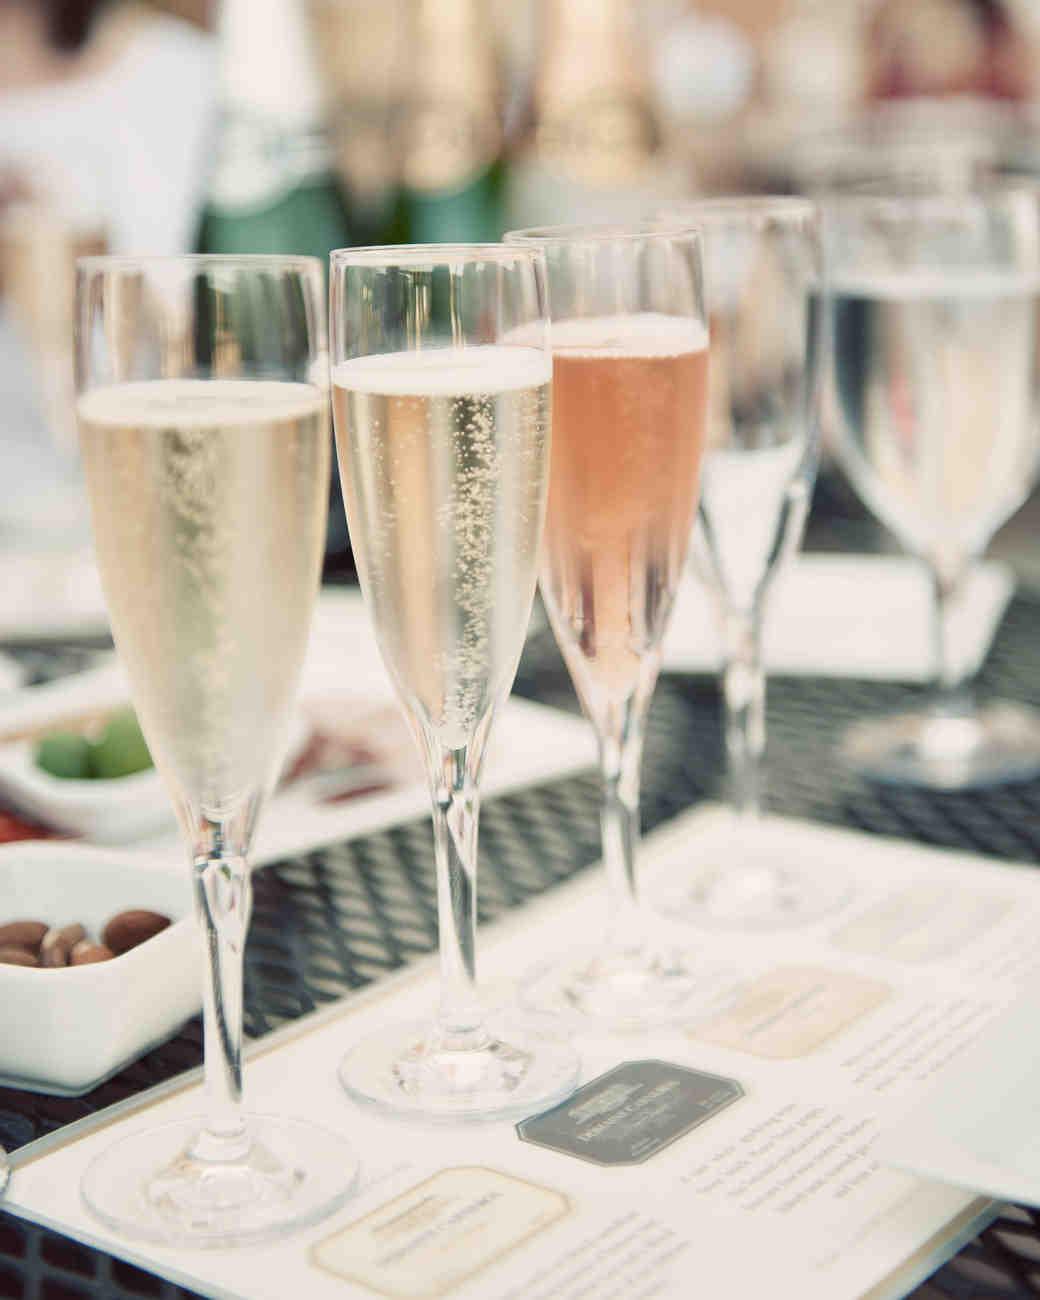 eatsleepwear-napa-valley-bachelorette-party-friends-sparkling-wine-tasting-0415.jpg